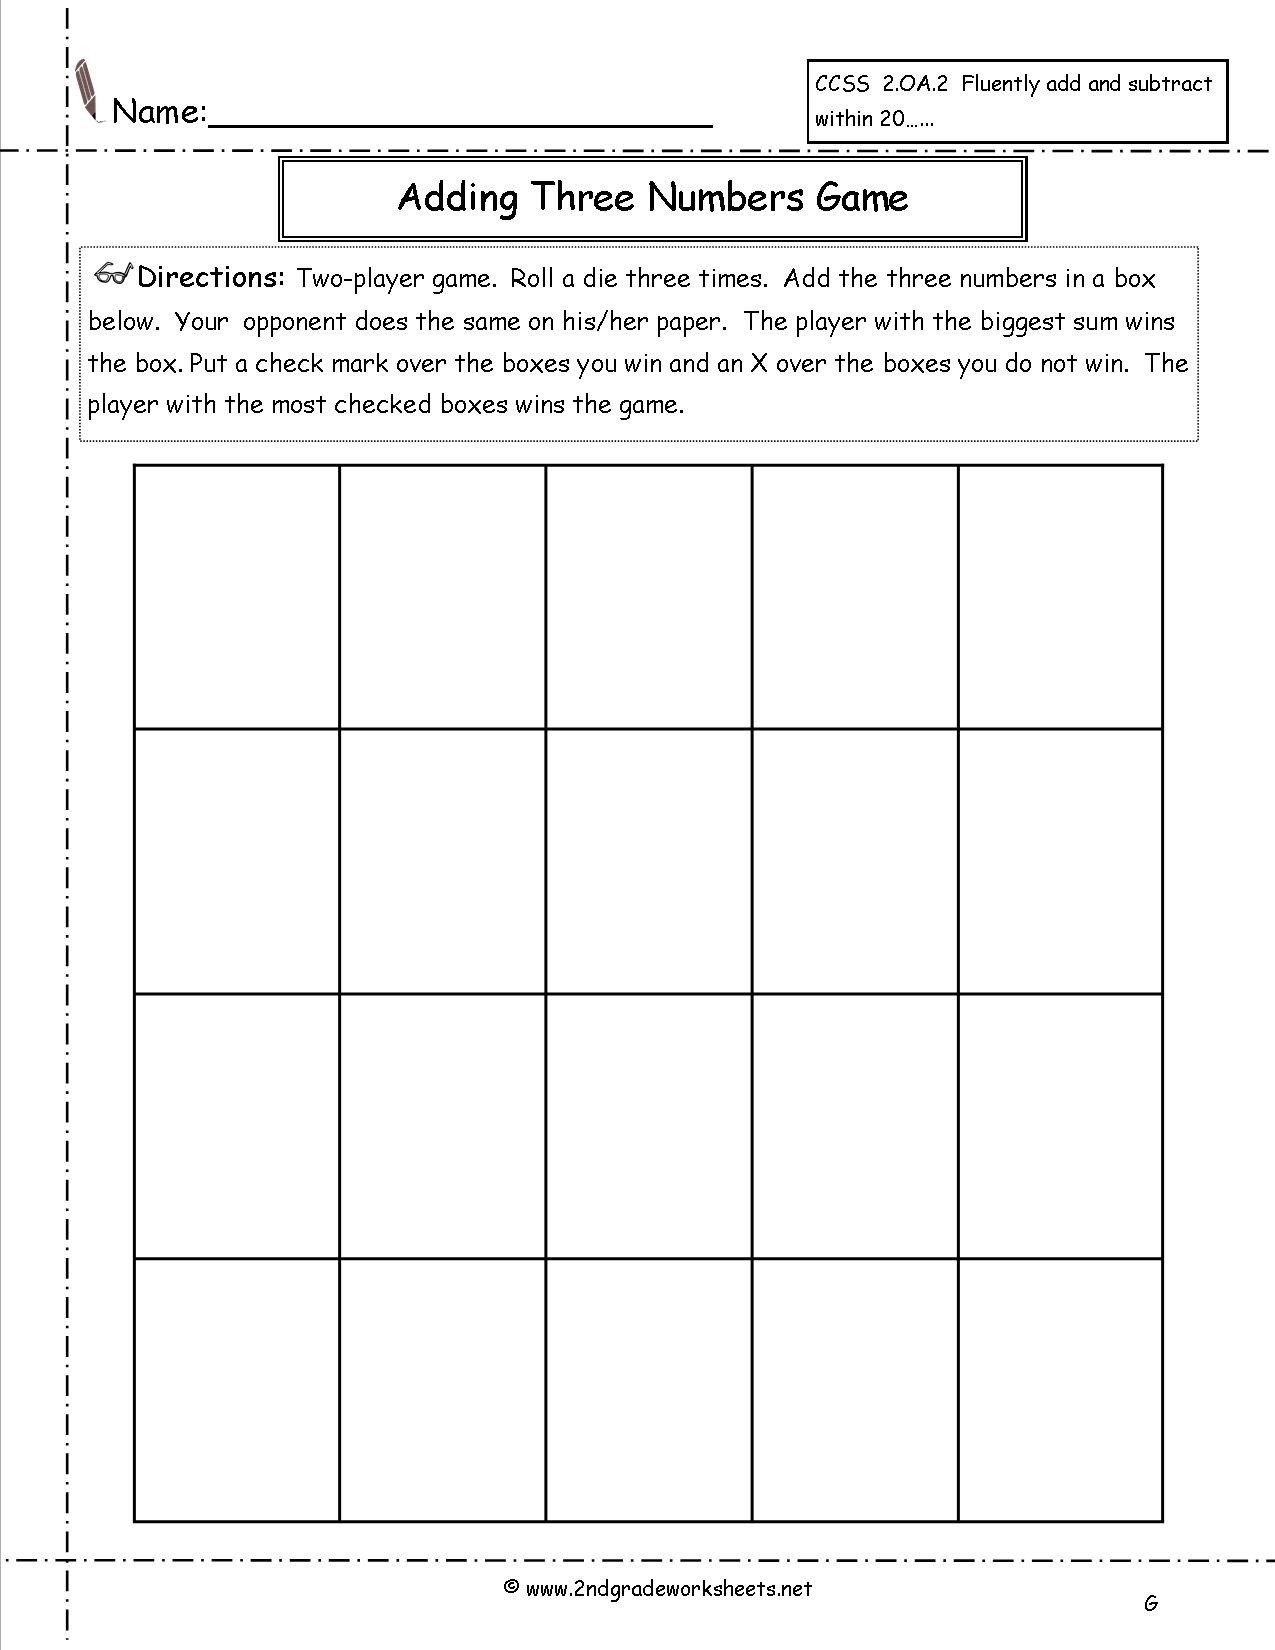 Adding Three Numbers Worksheet Add Three Numbers Worksheet